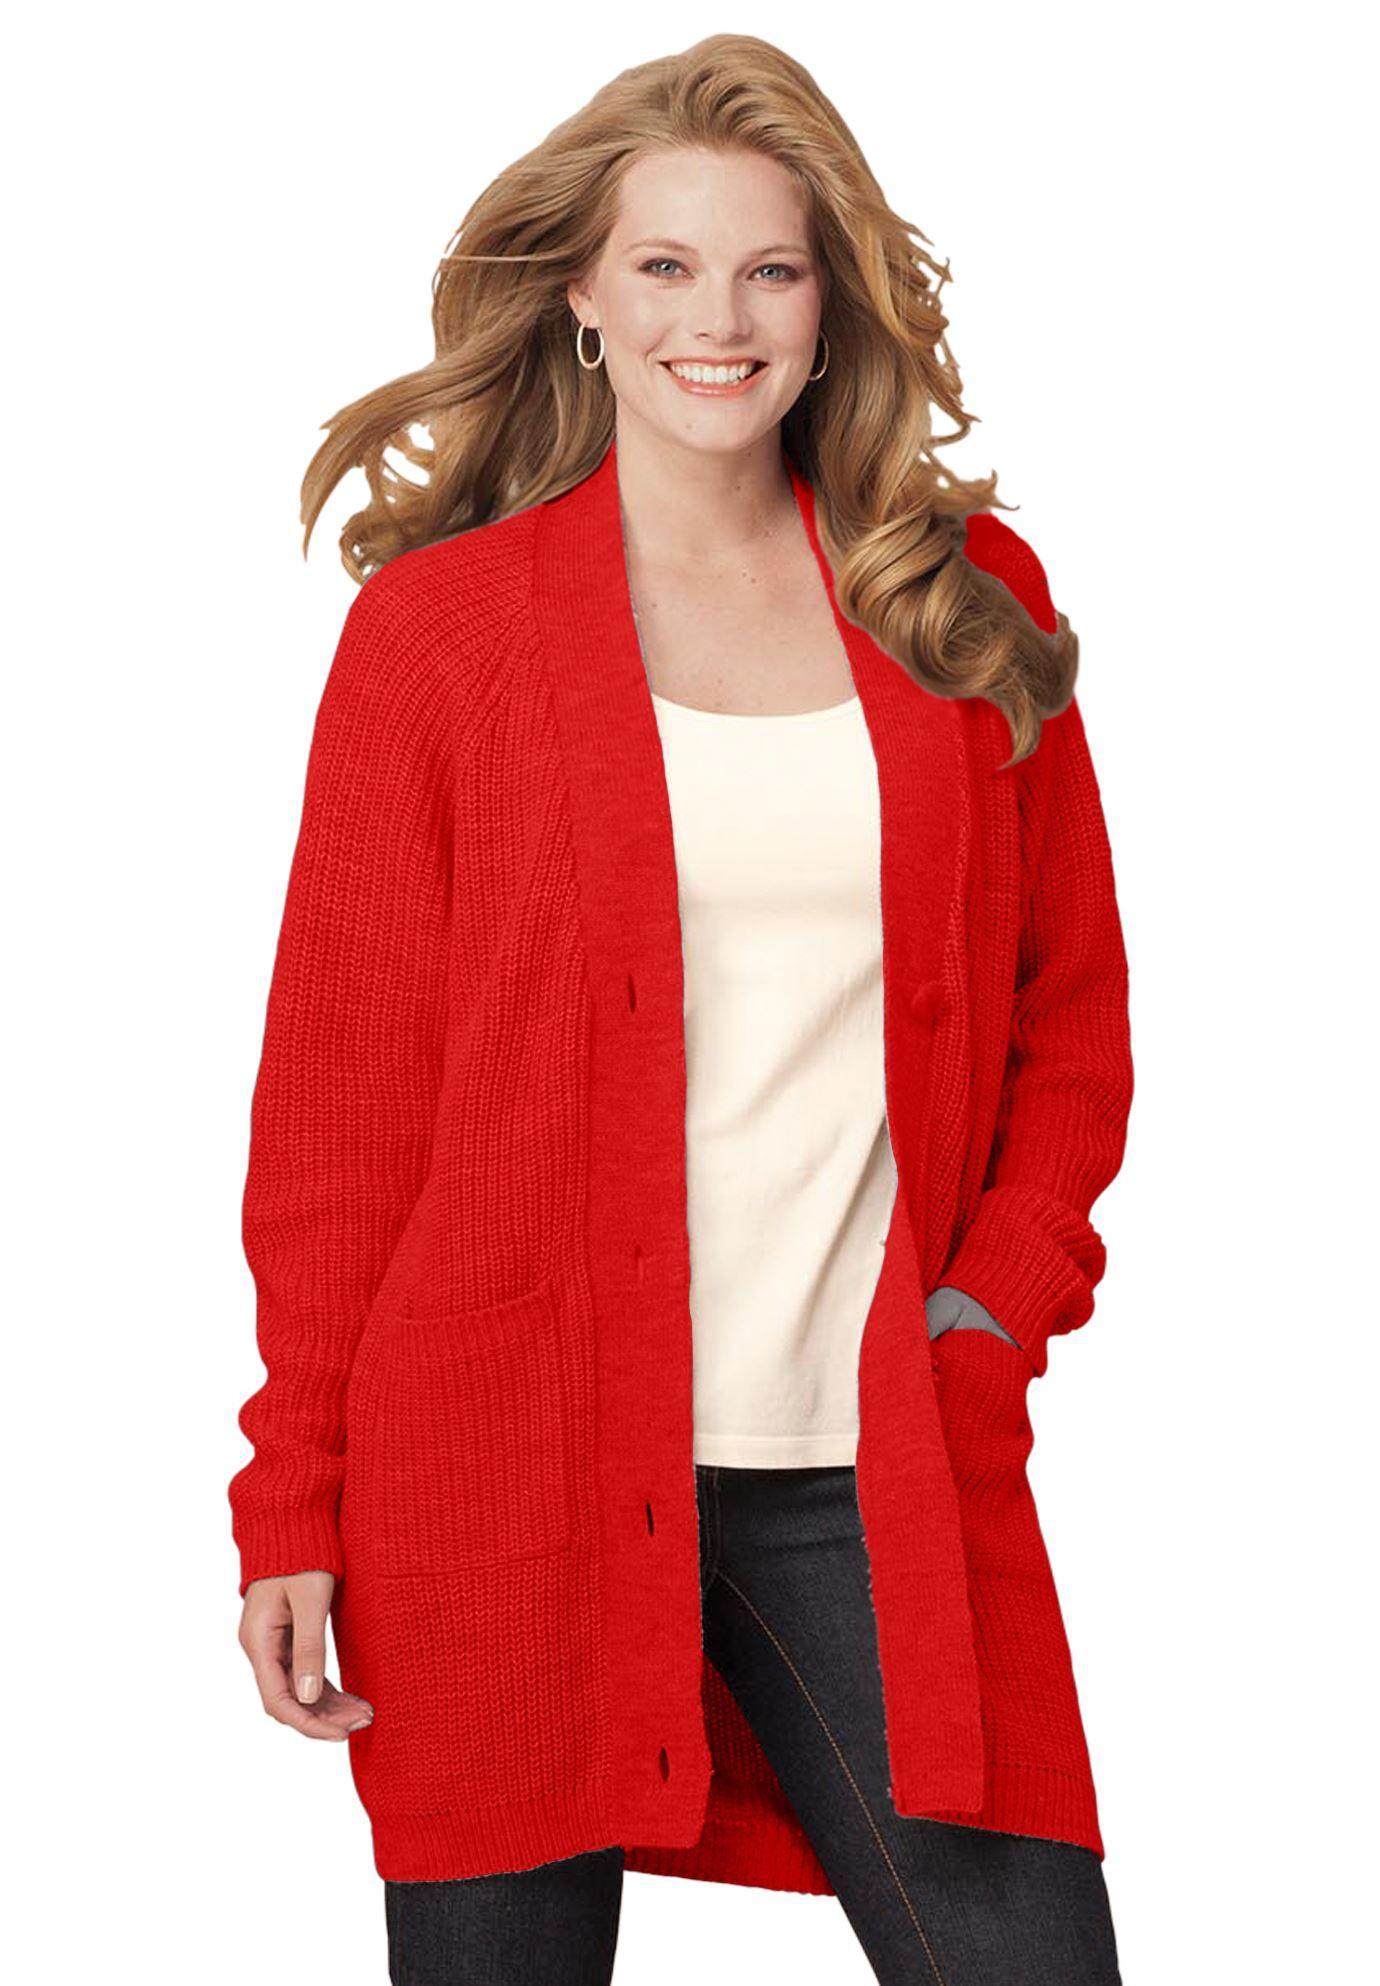 Red Plus Size Cardigan Insaatmcpgroupco